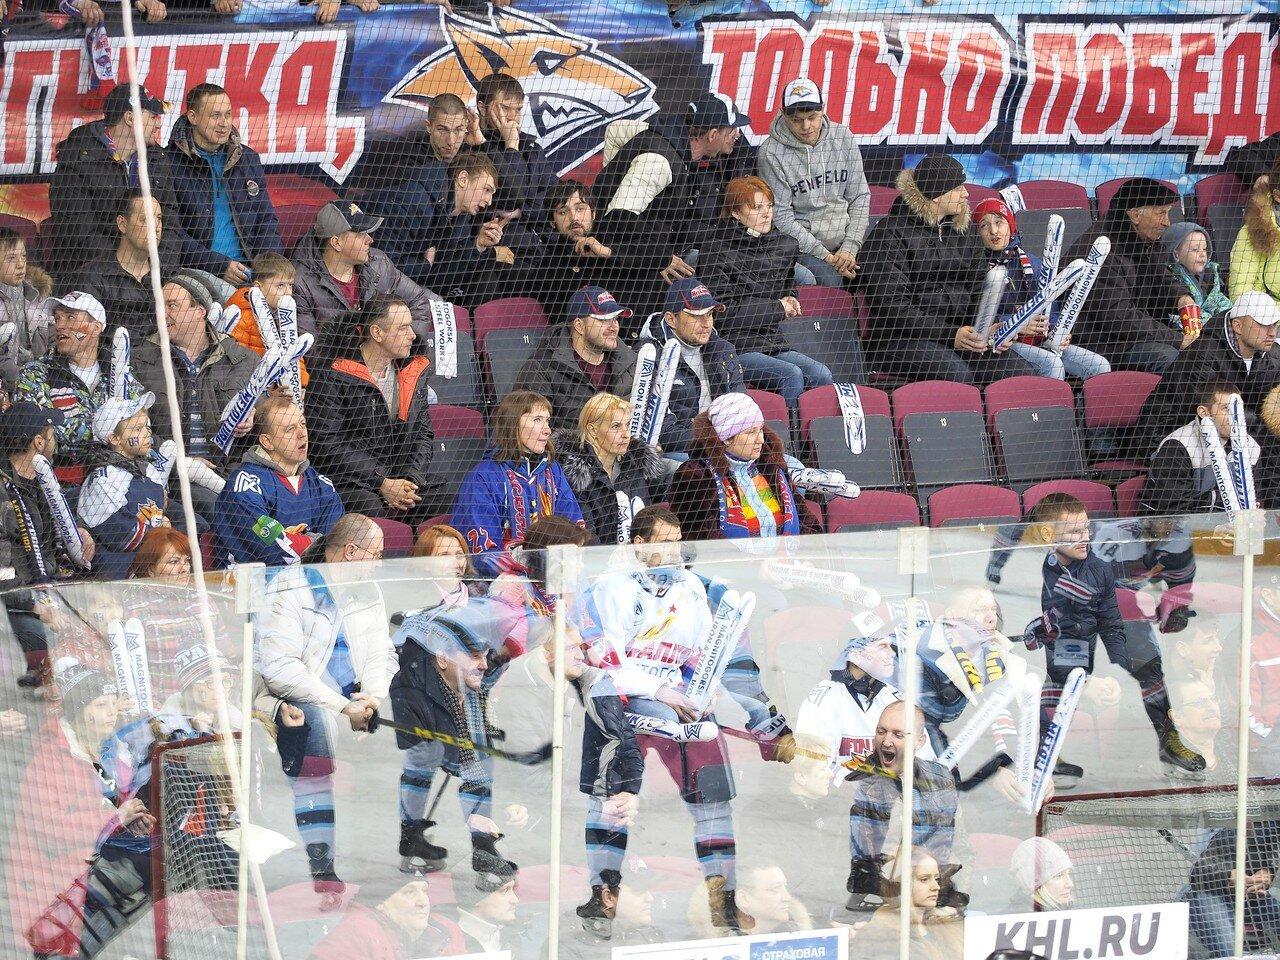 73Плей-офф 2016 Восток 1/2 Металлург - Сибирь 10.03.2016